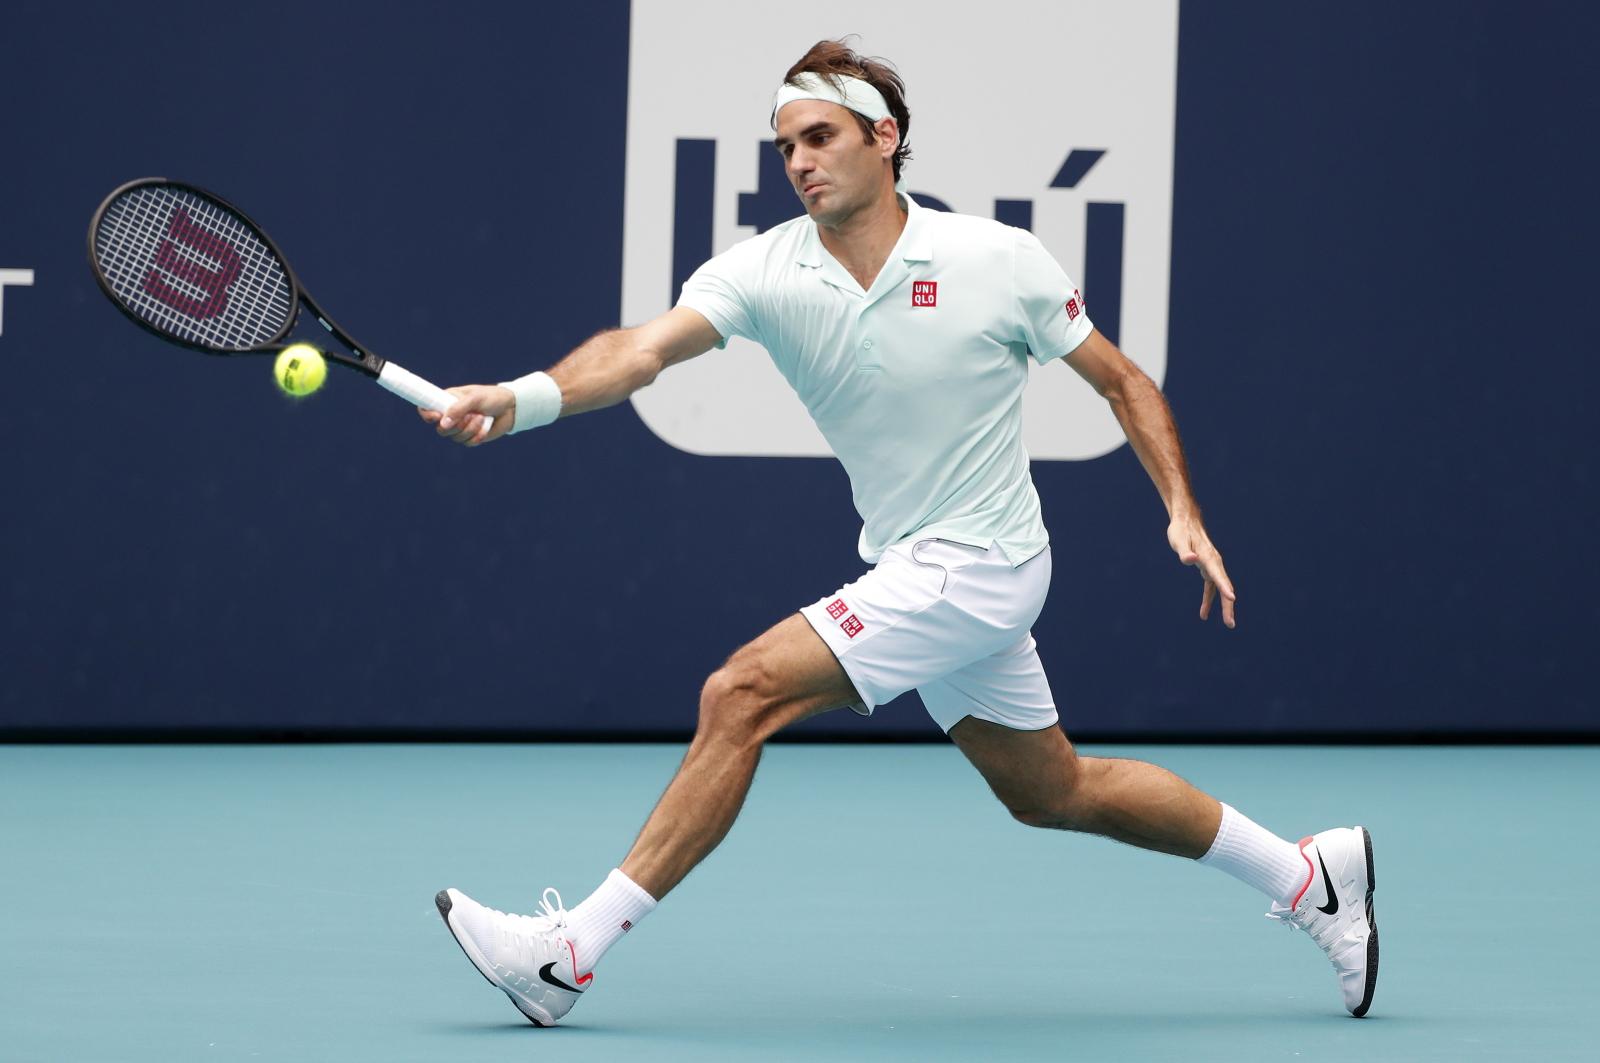 Roger Federer podczas Miami Open. Fot. PAP/EPA/RHONA WISE